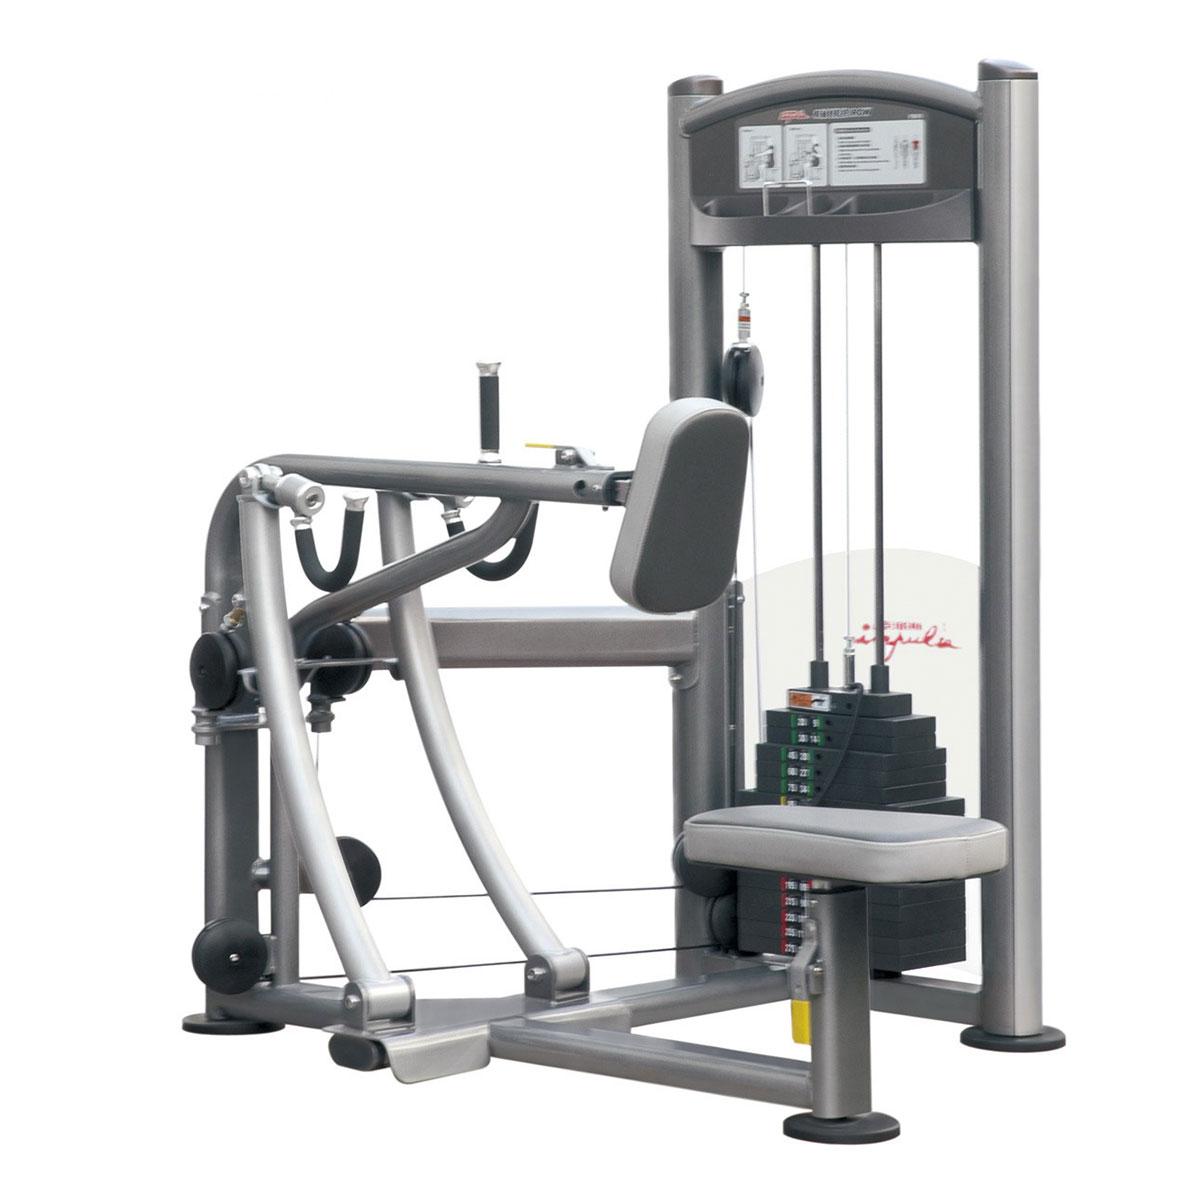 Row - 275 lbs